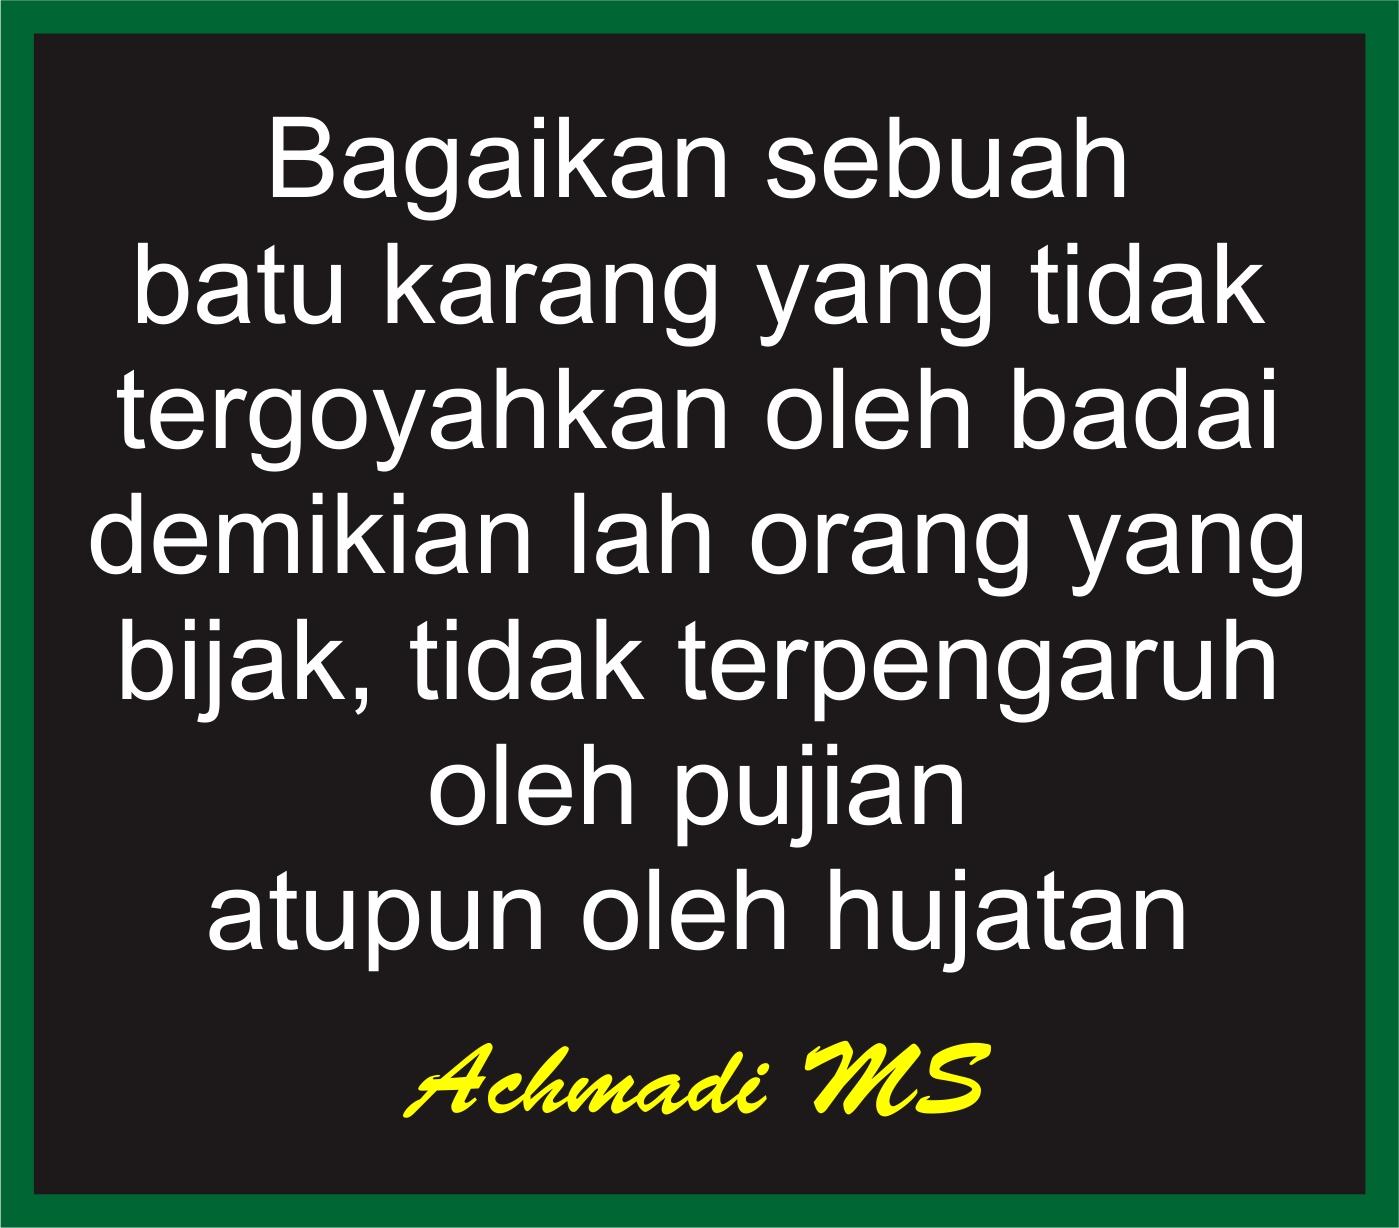 achmadims.com